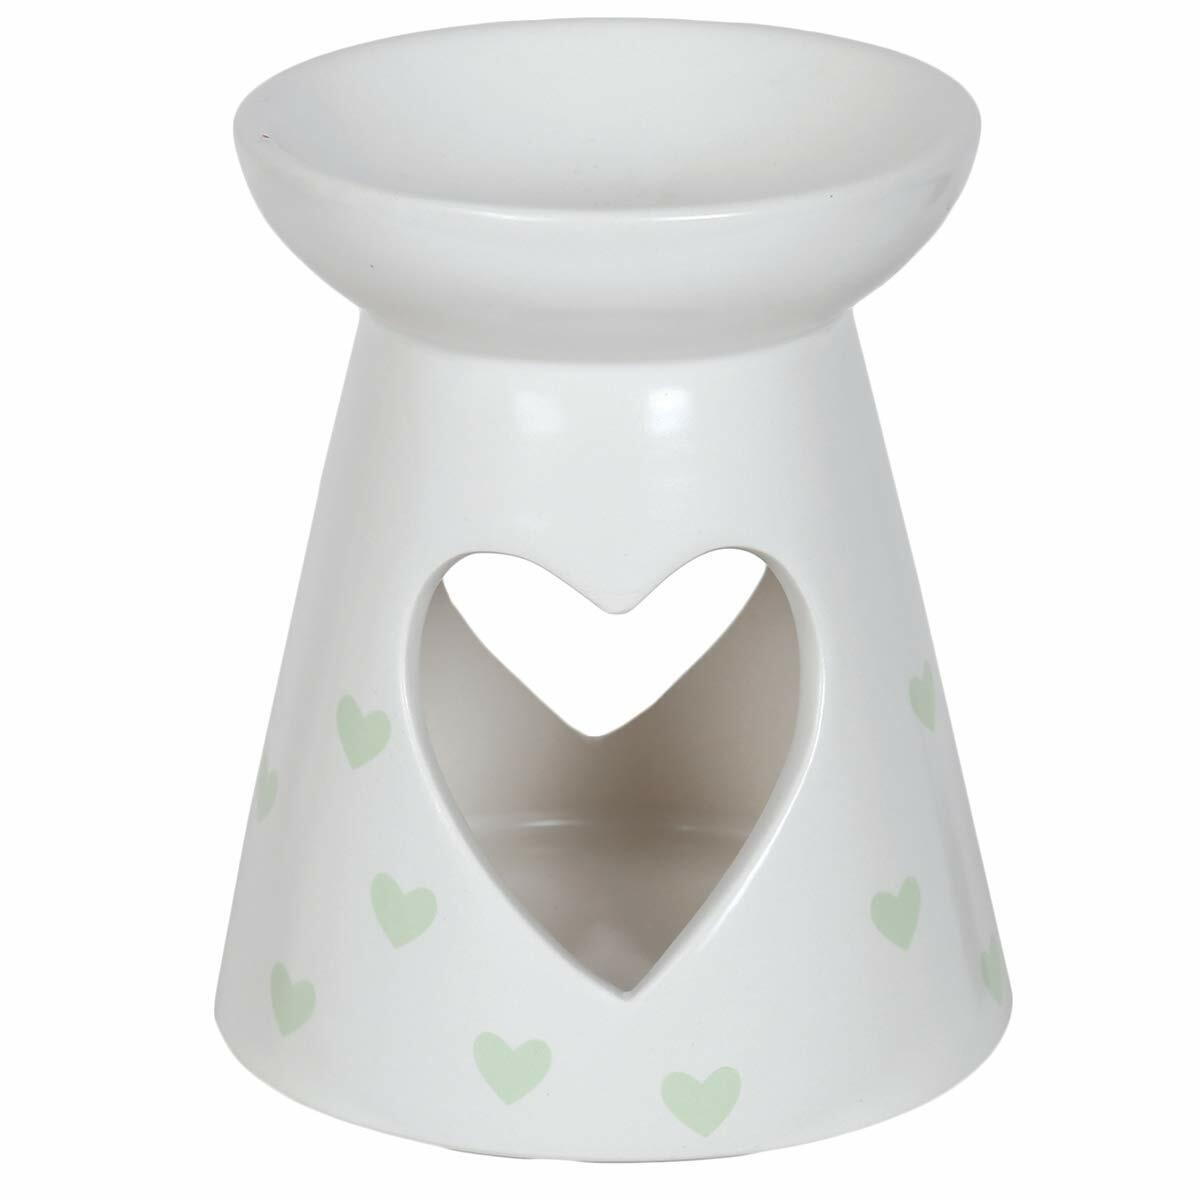 Aroma Accessories Green Hearts Pattern Ceramic Wax Melt Burner 13cm high